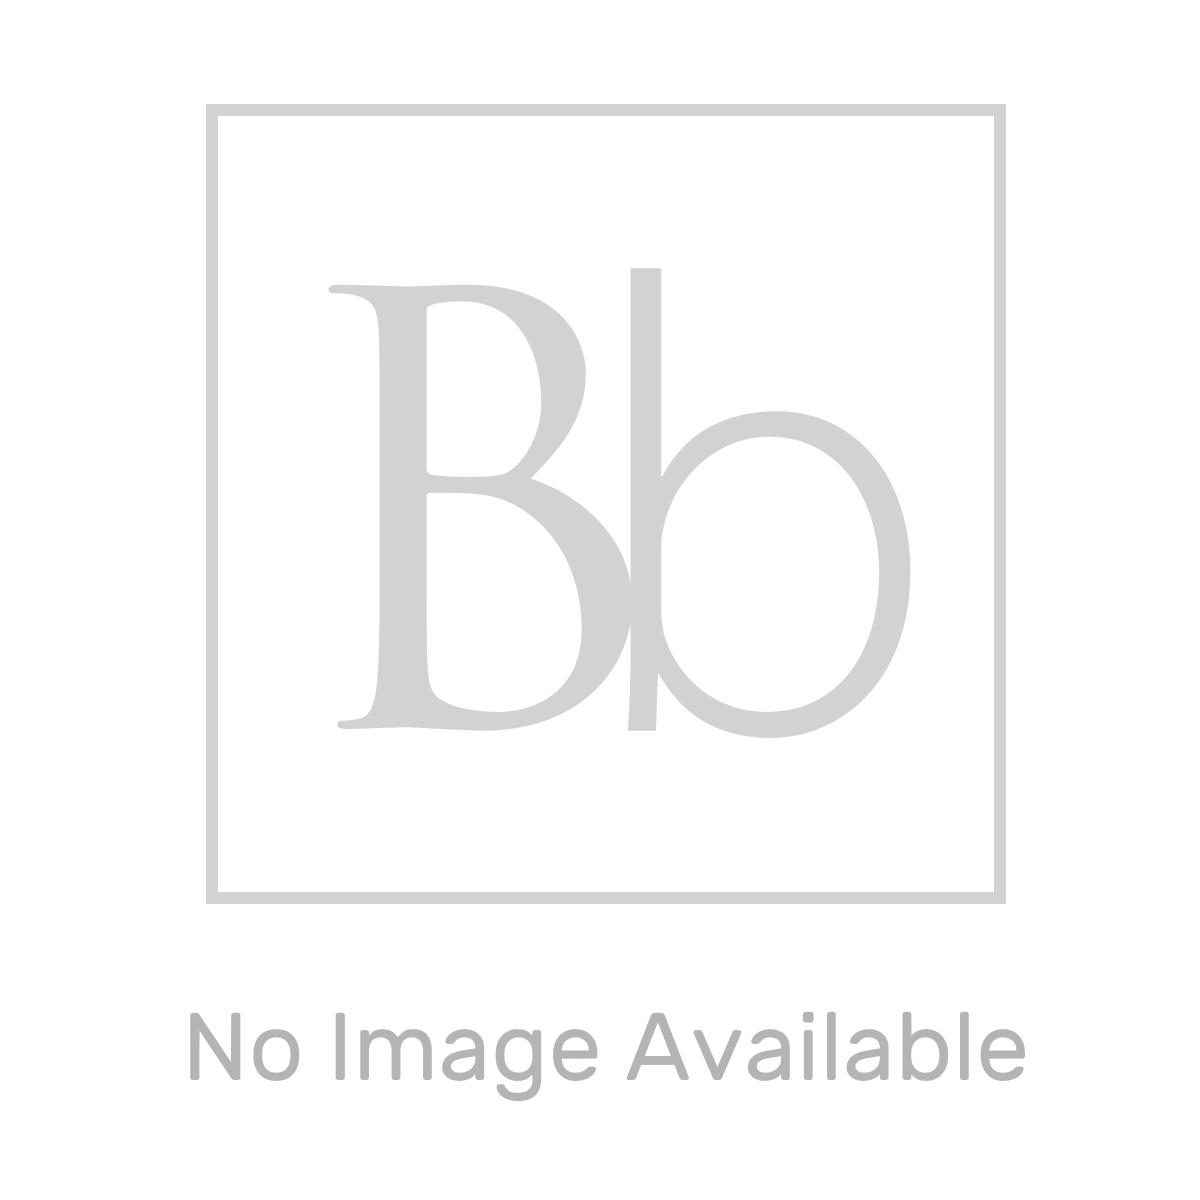 Sink on top of toilet